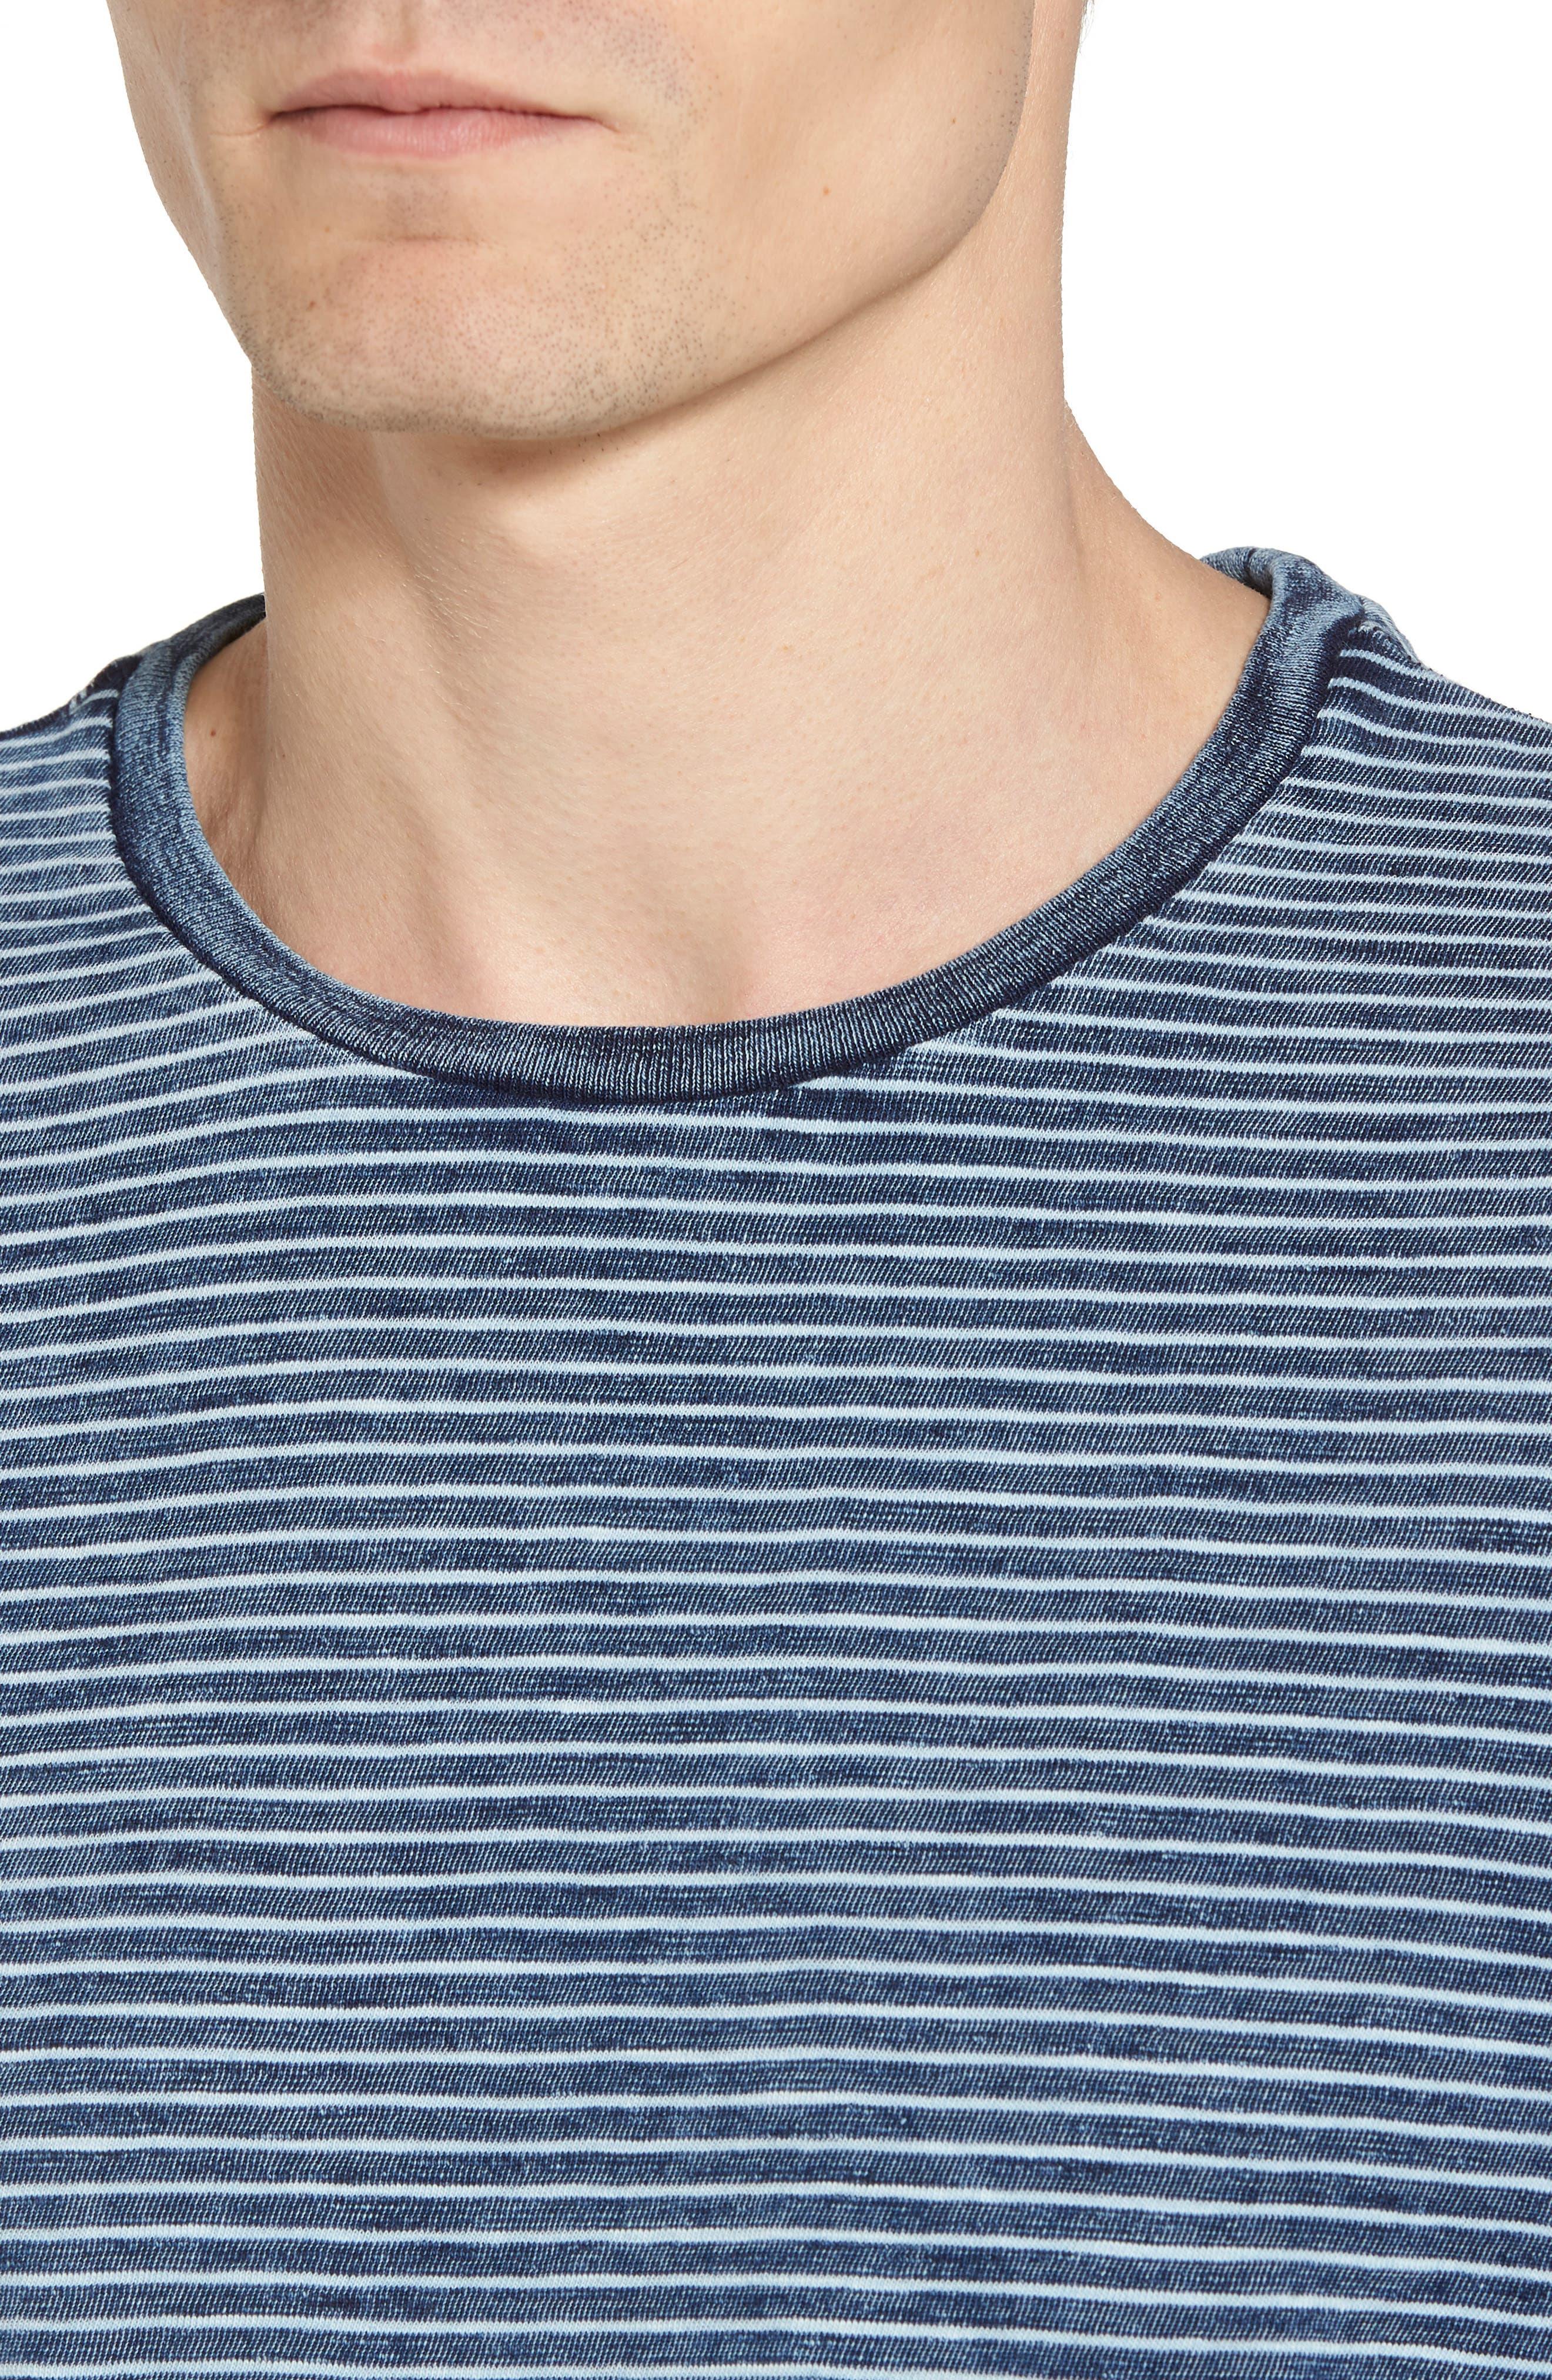 Julian Slim Fit Crewneck Shirt,                             Alternate thumbnail 4, color,                             Marbled Indigo/ White Stripe